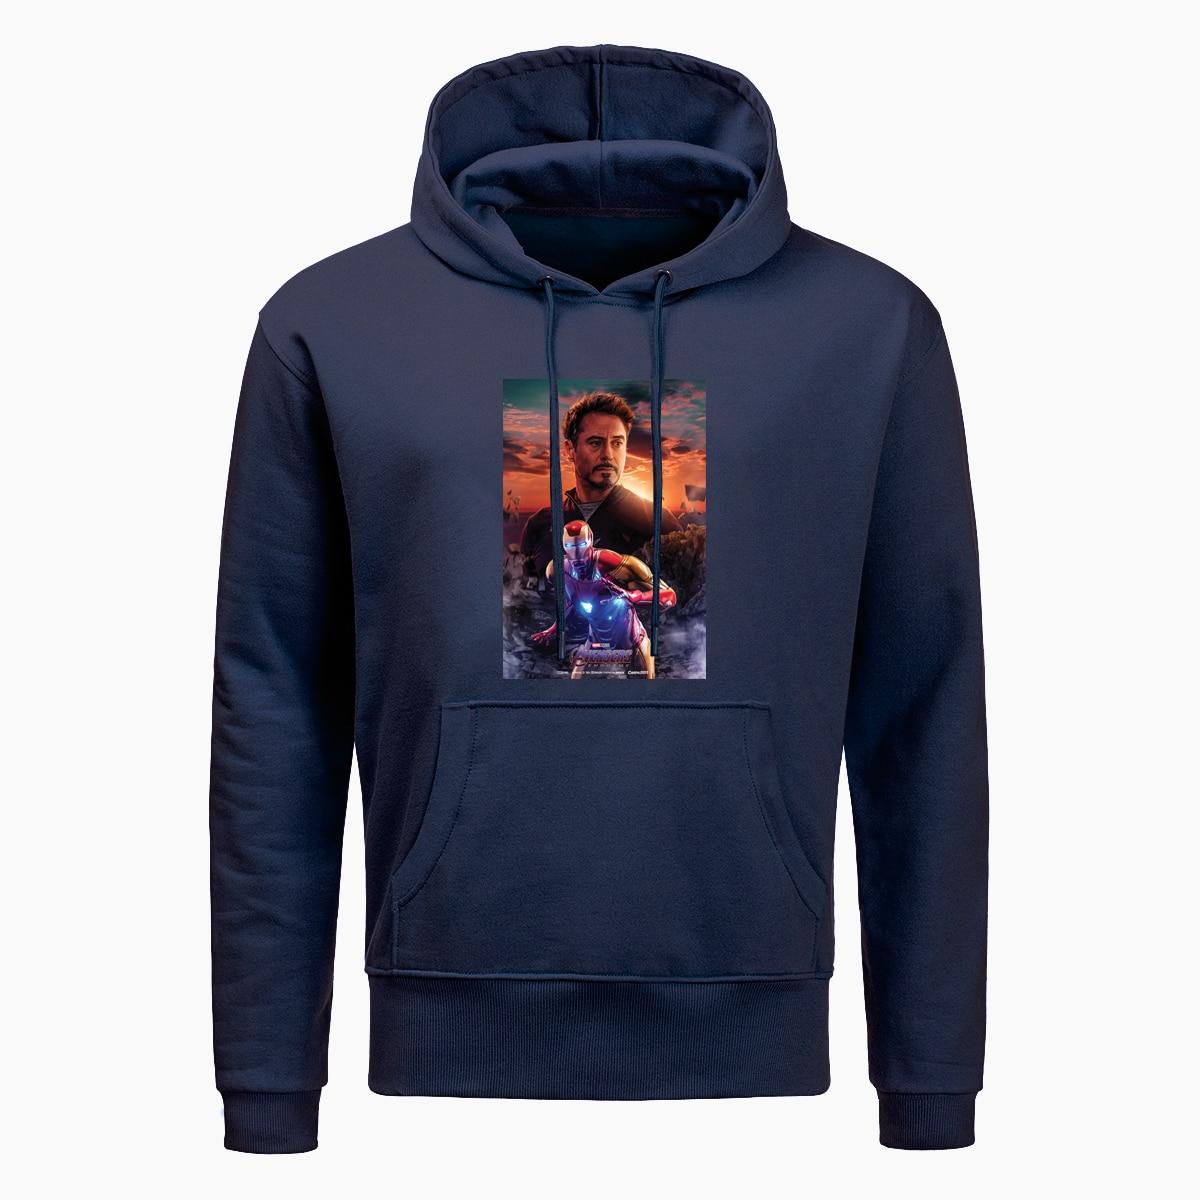 New Avengers Endgame Iron Man Tony Stark Print Hoodies Men Marvel Superhero Hoodie Fashion Autumn Wiinter Sweatshirt